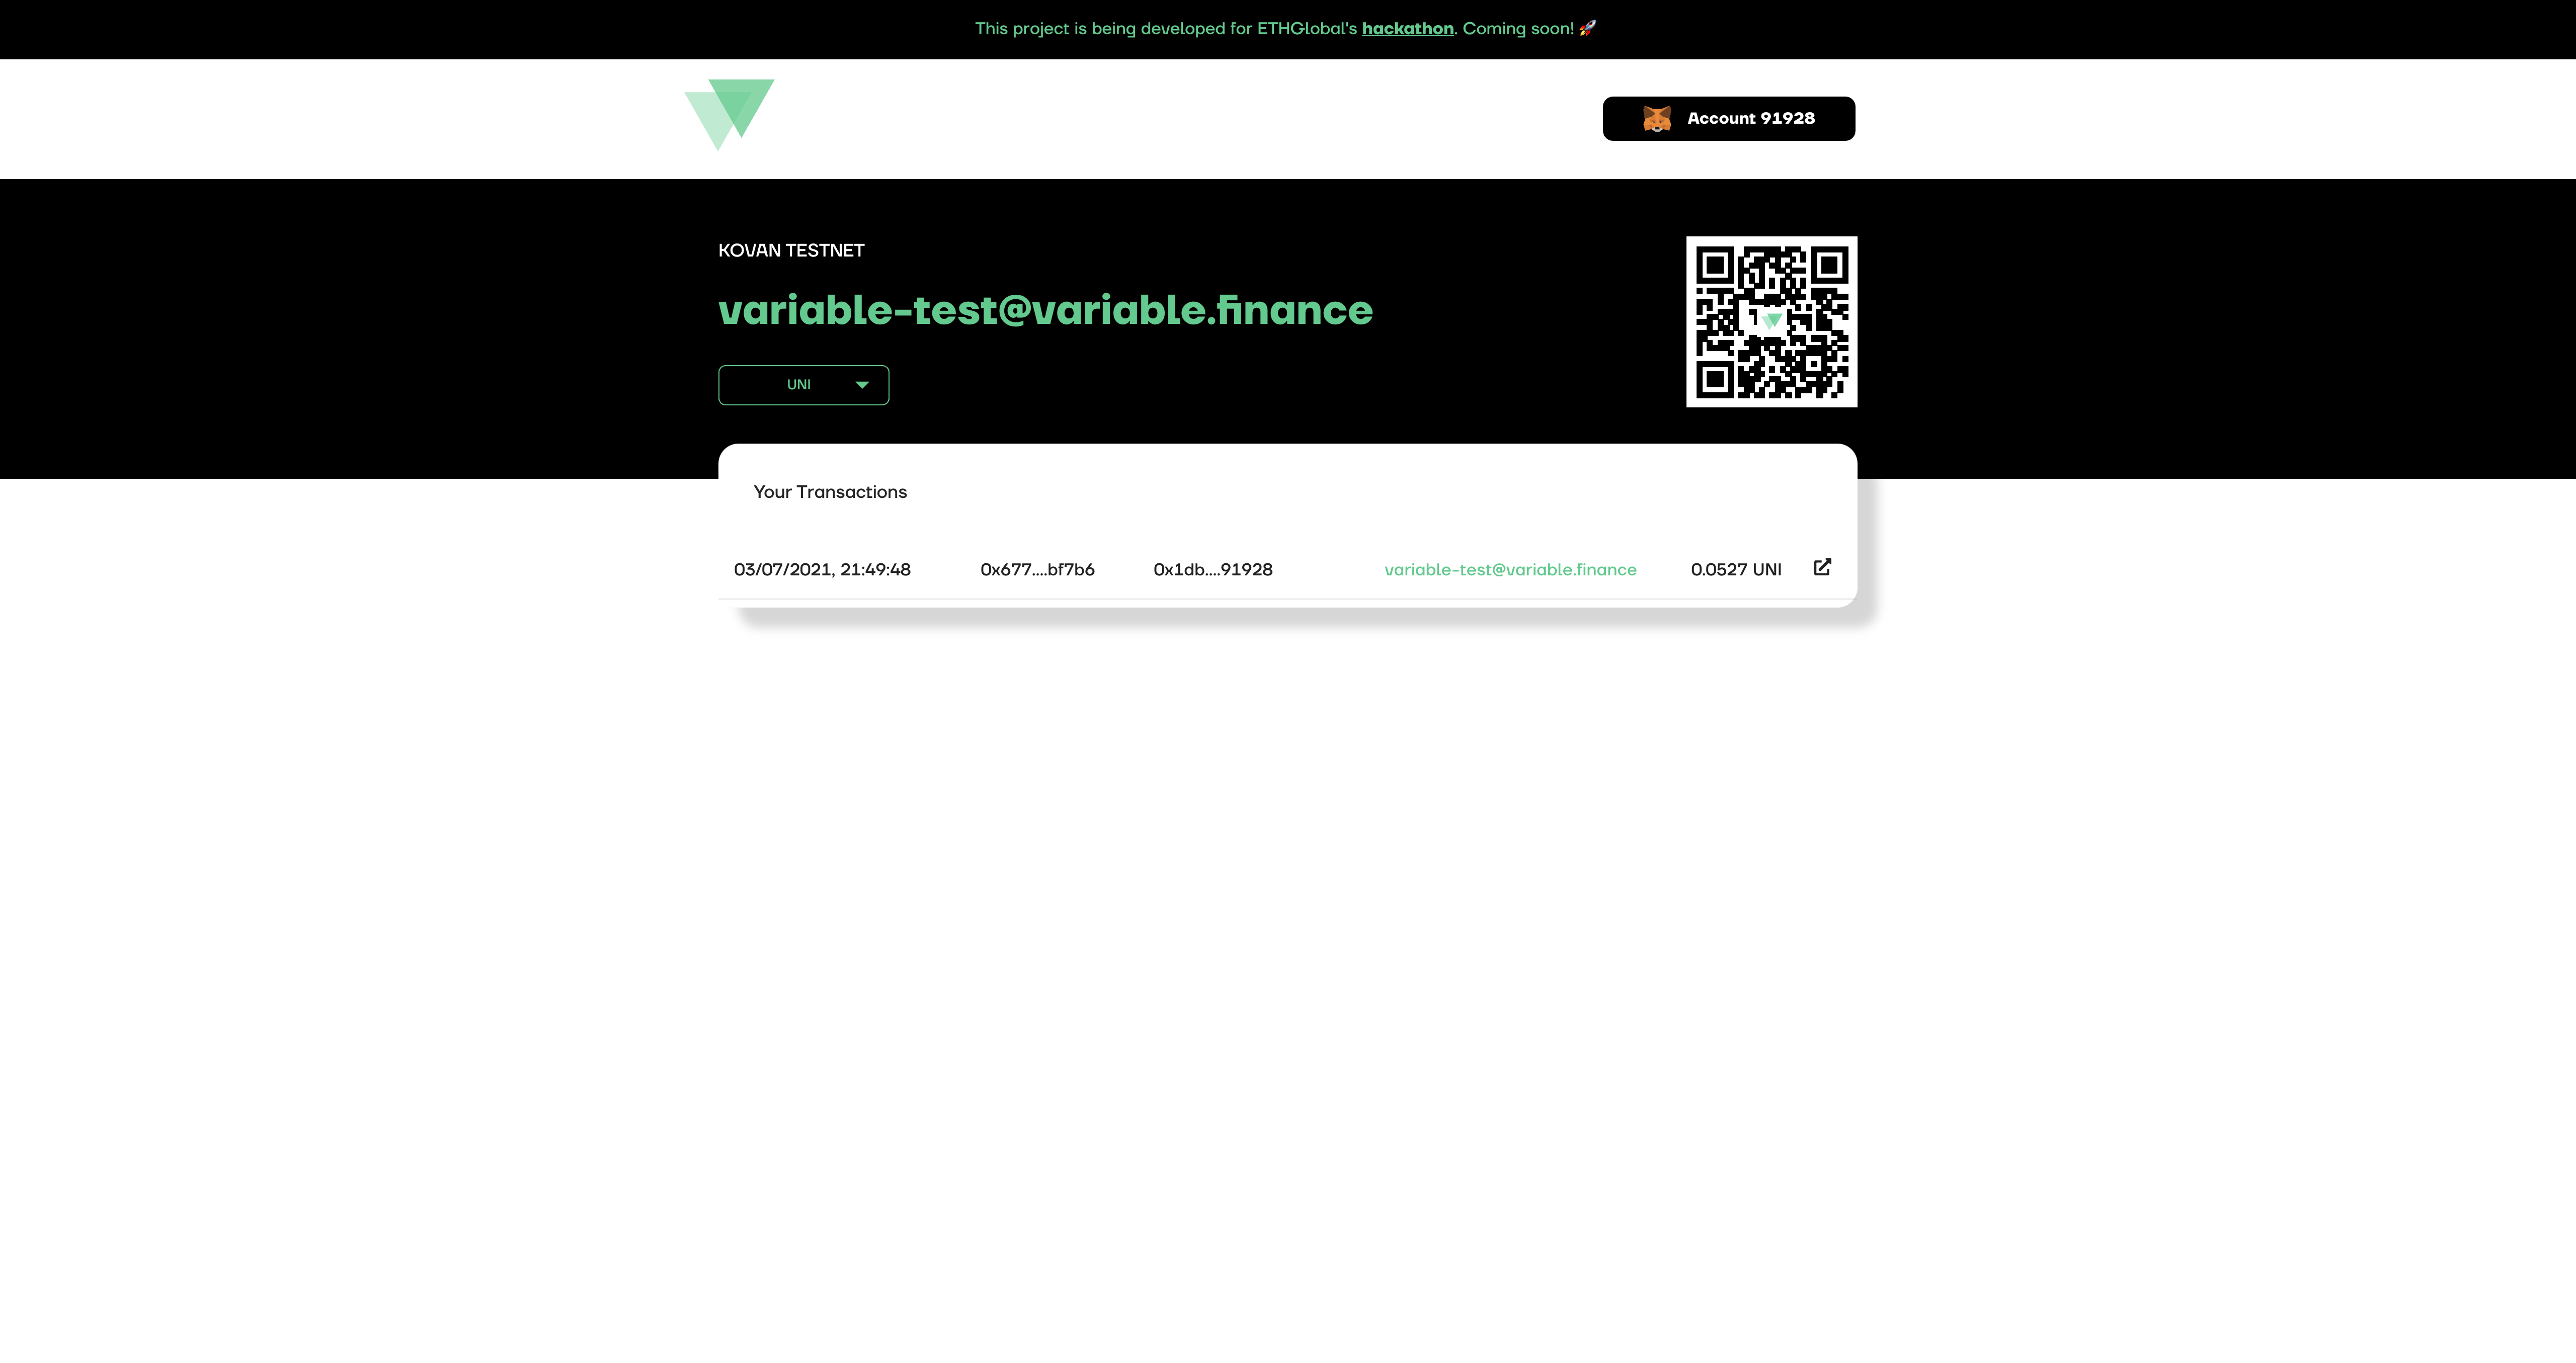 https://ethglobal.s3.amazonaws.com/recxSEF3UVcy7KVFa/Screenshot_2021-07-03_at_10.04.30_PM.png